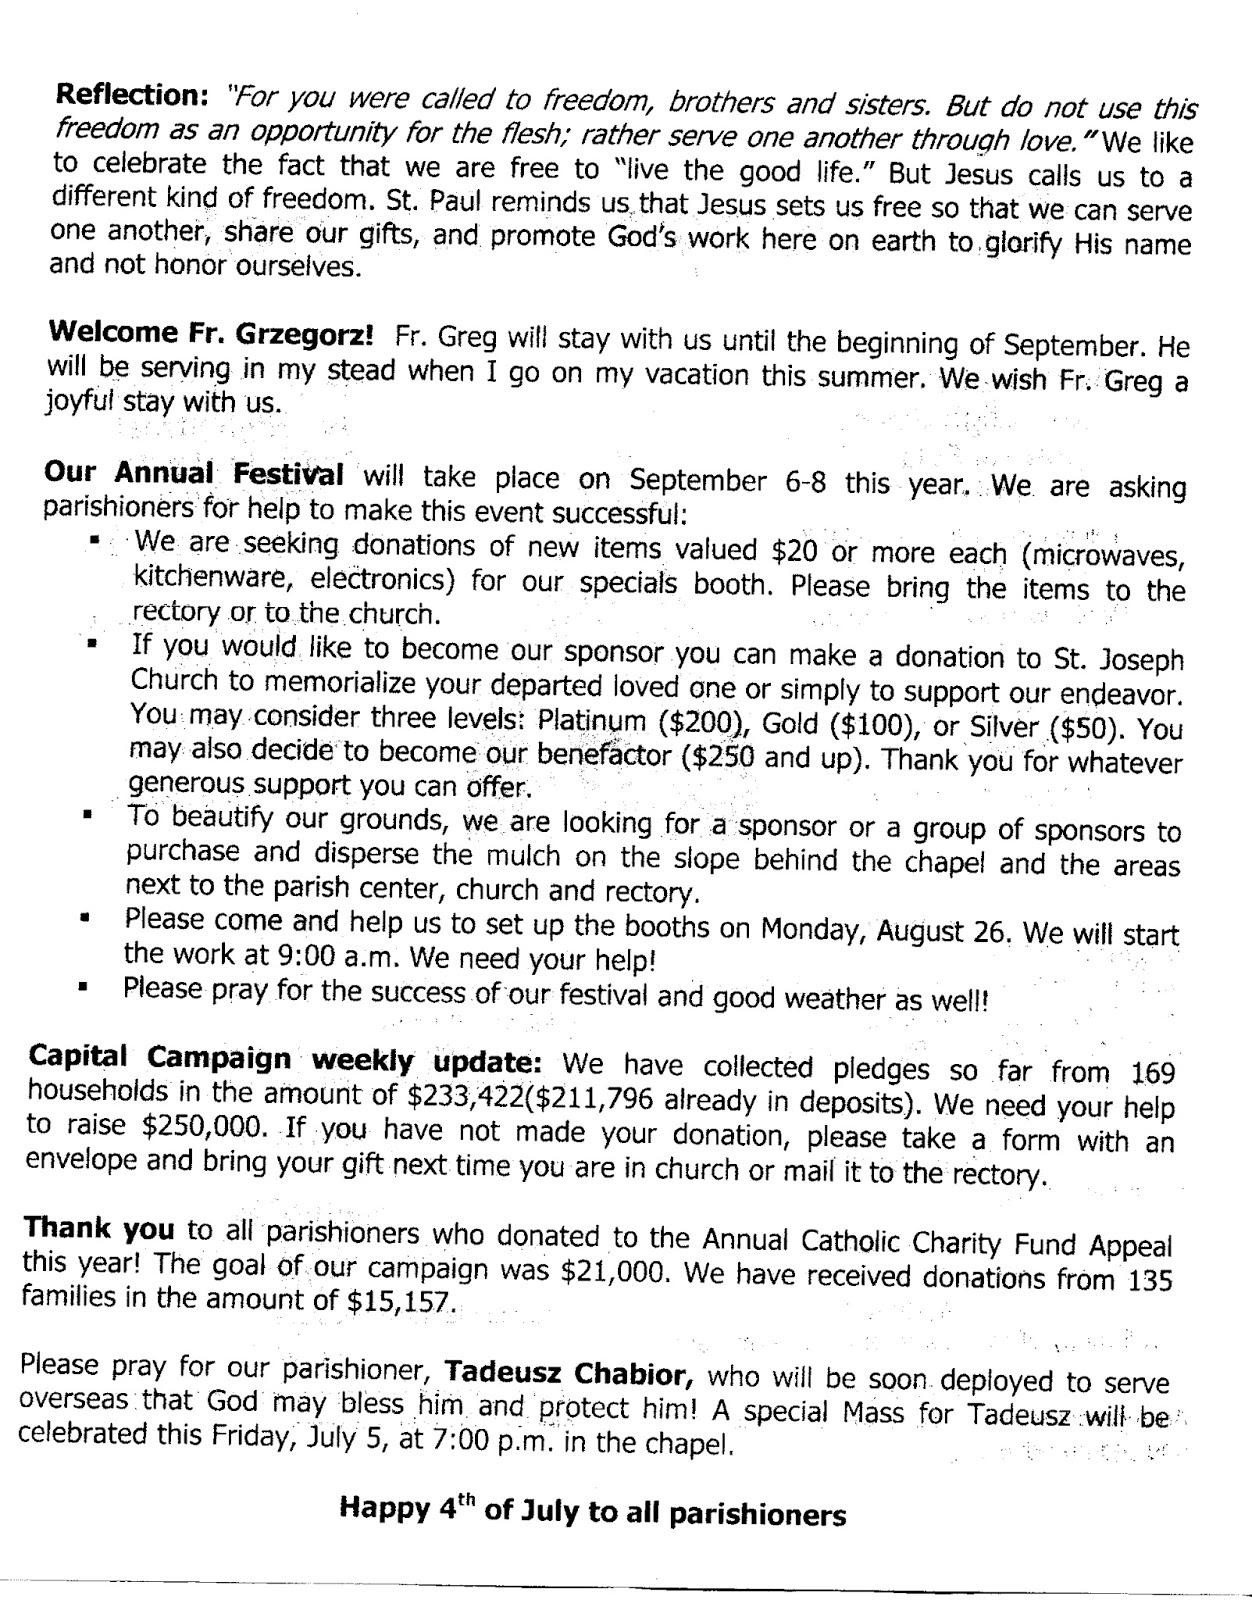 St Joseph's Church Services & Parish Family Life Info